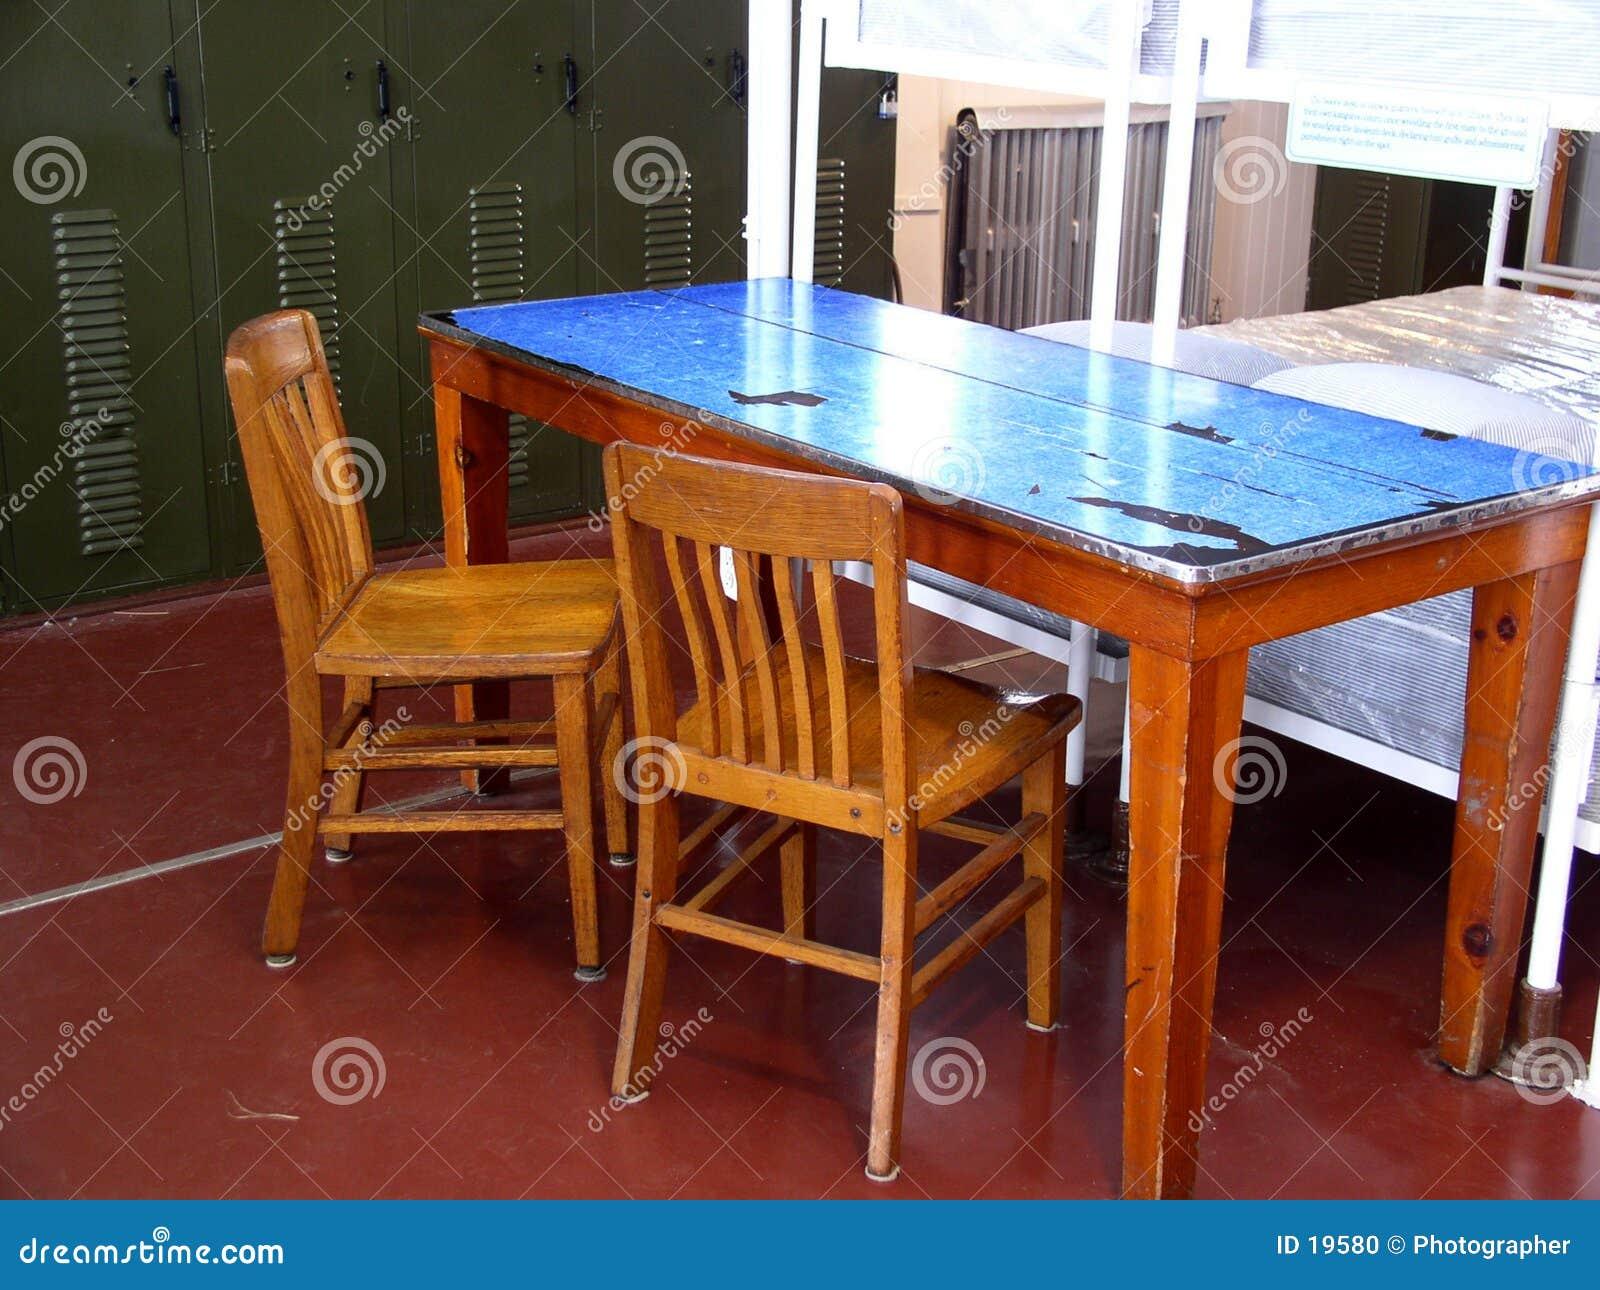 Crew quarters table